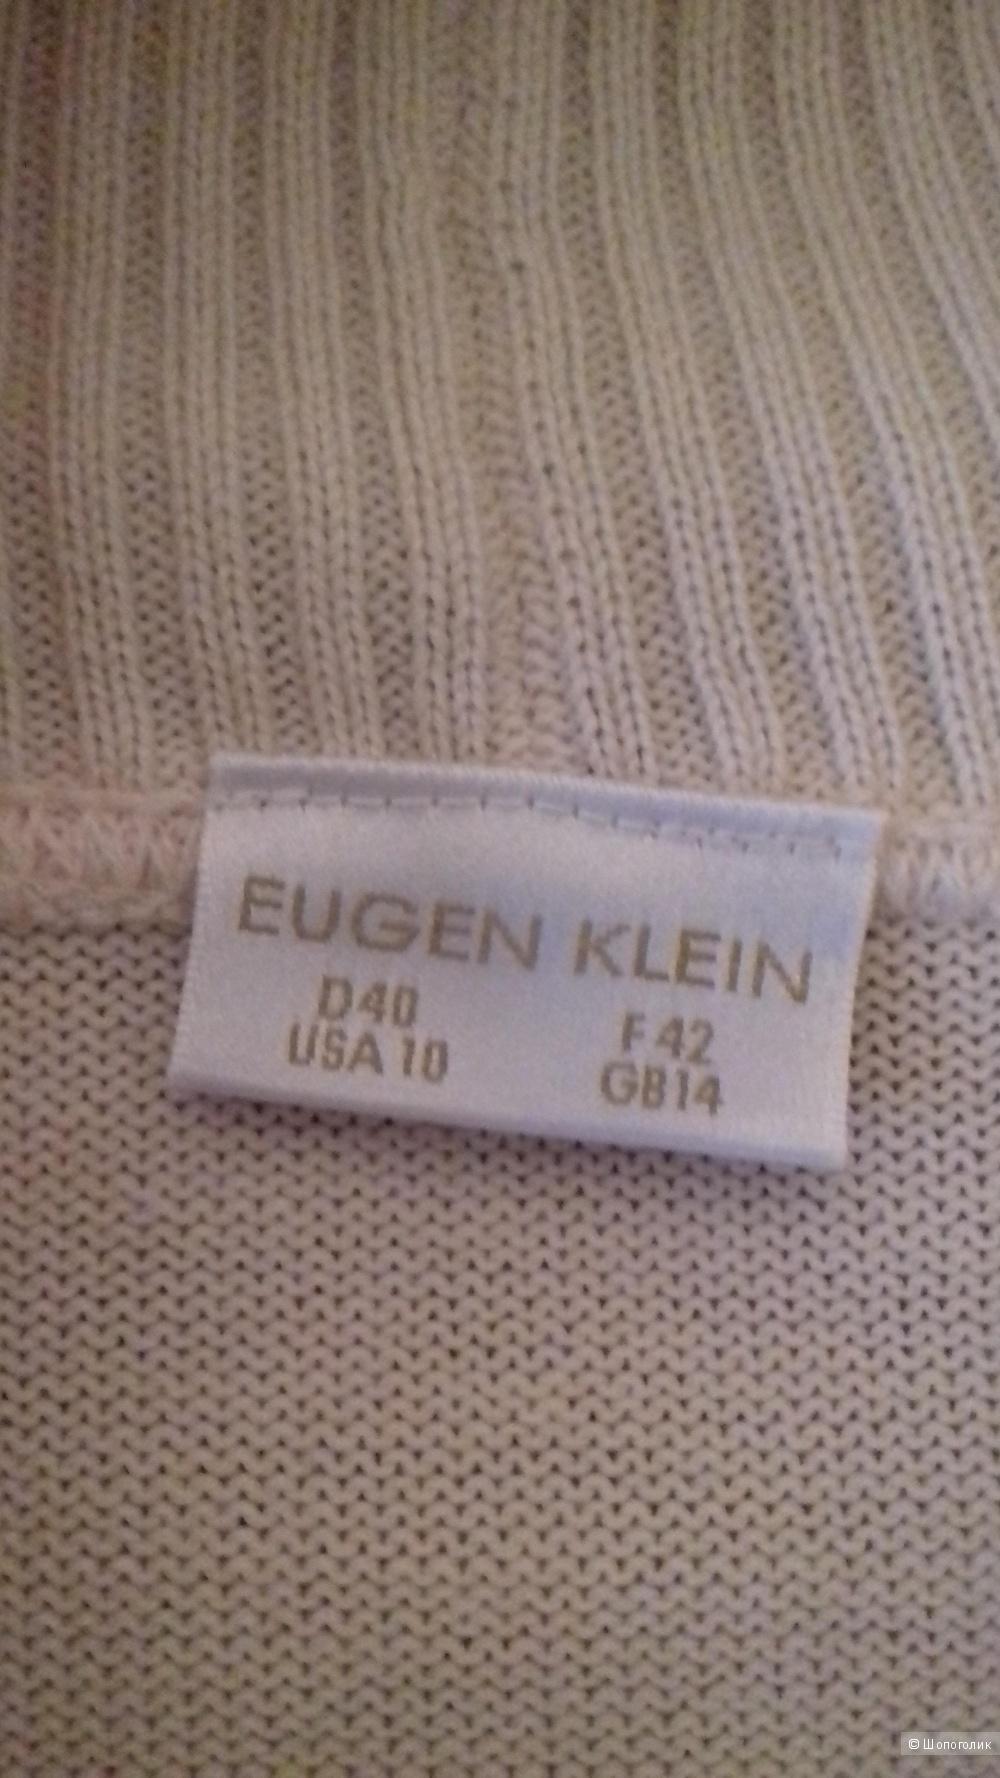 Кардиган и шарф, Eugen Klein, р. USA 10, русский 46-50.